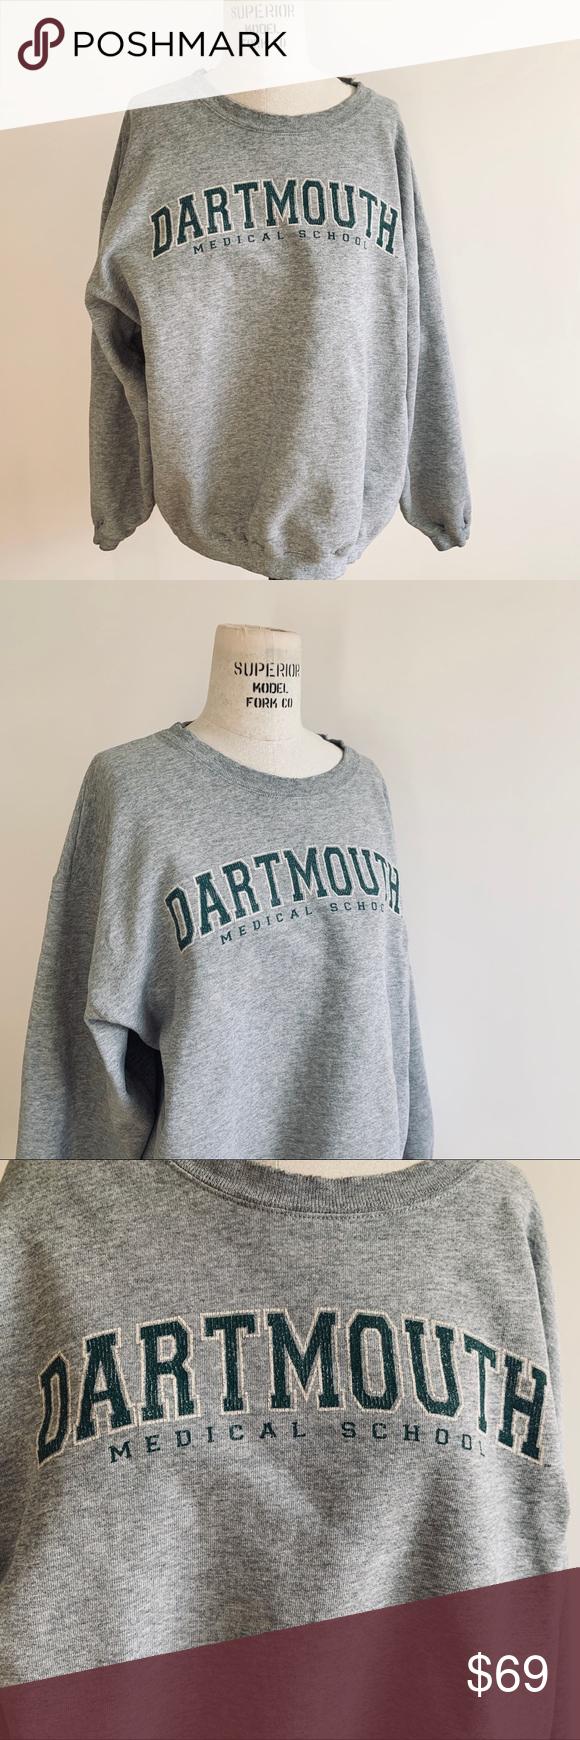 Sold Vintage Dartmouth Medical School Sweatshirt Vintage Sweatshirt School Sweatshirts Sweatshirts [ 1740 x 580 Pixel ]